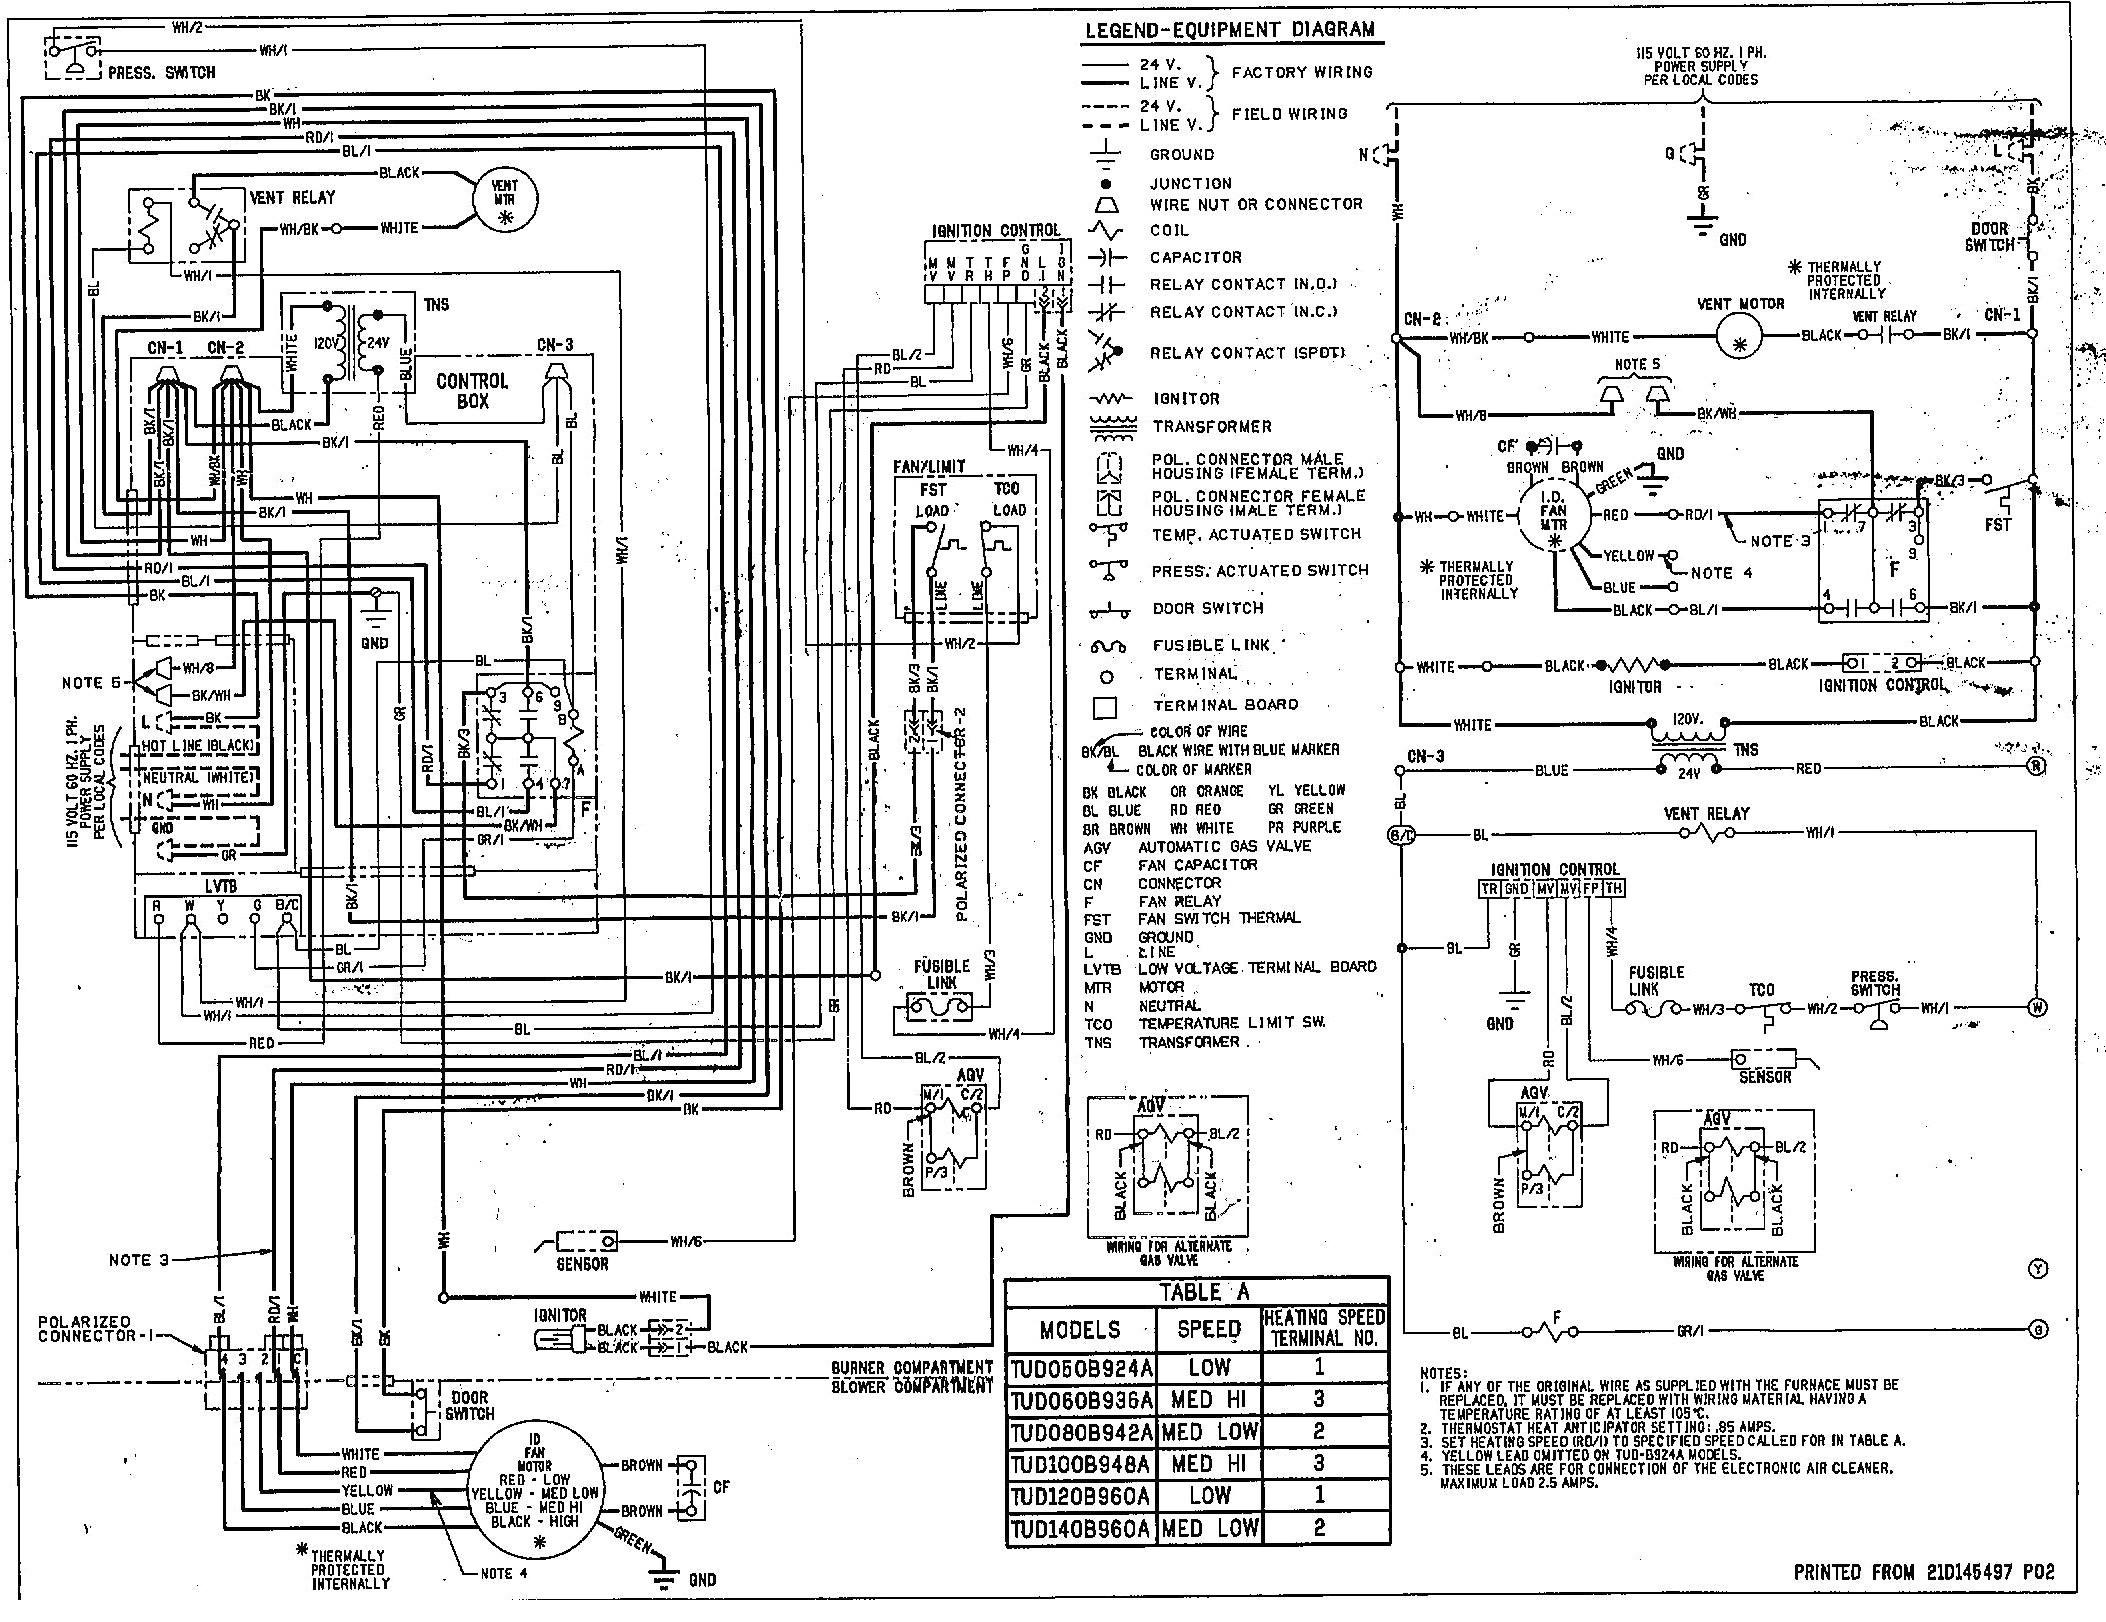 Trane Weathertron thermostat Wiring Diagram Beautiful Trane Weathertron thermostat Wiring Diagram Wiring Diagram Fresh Trane